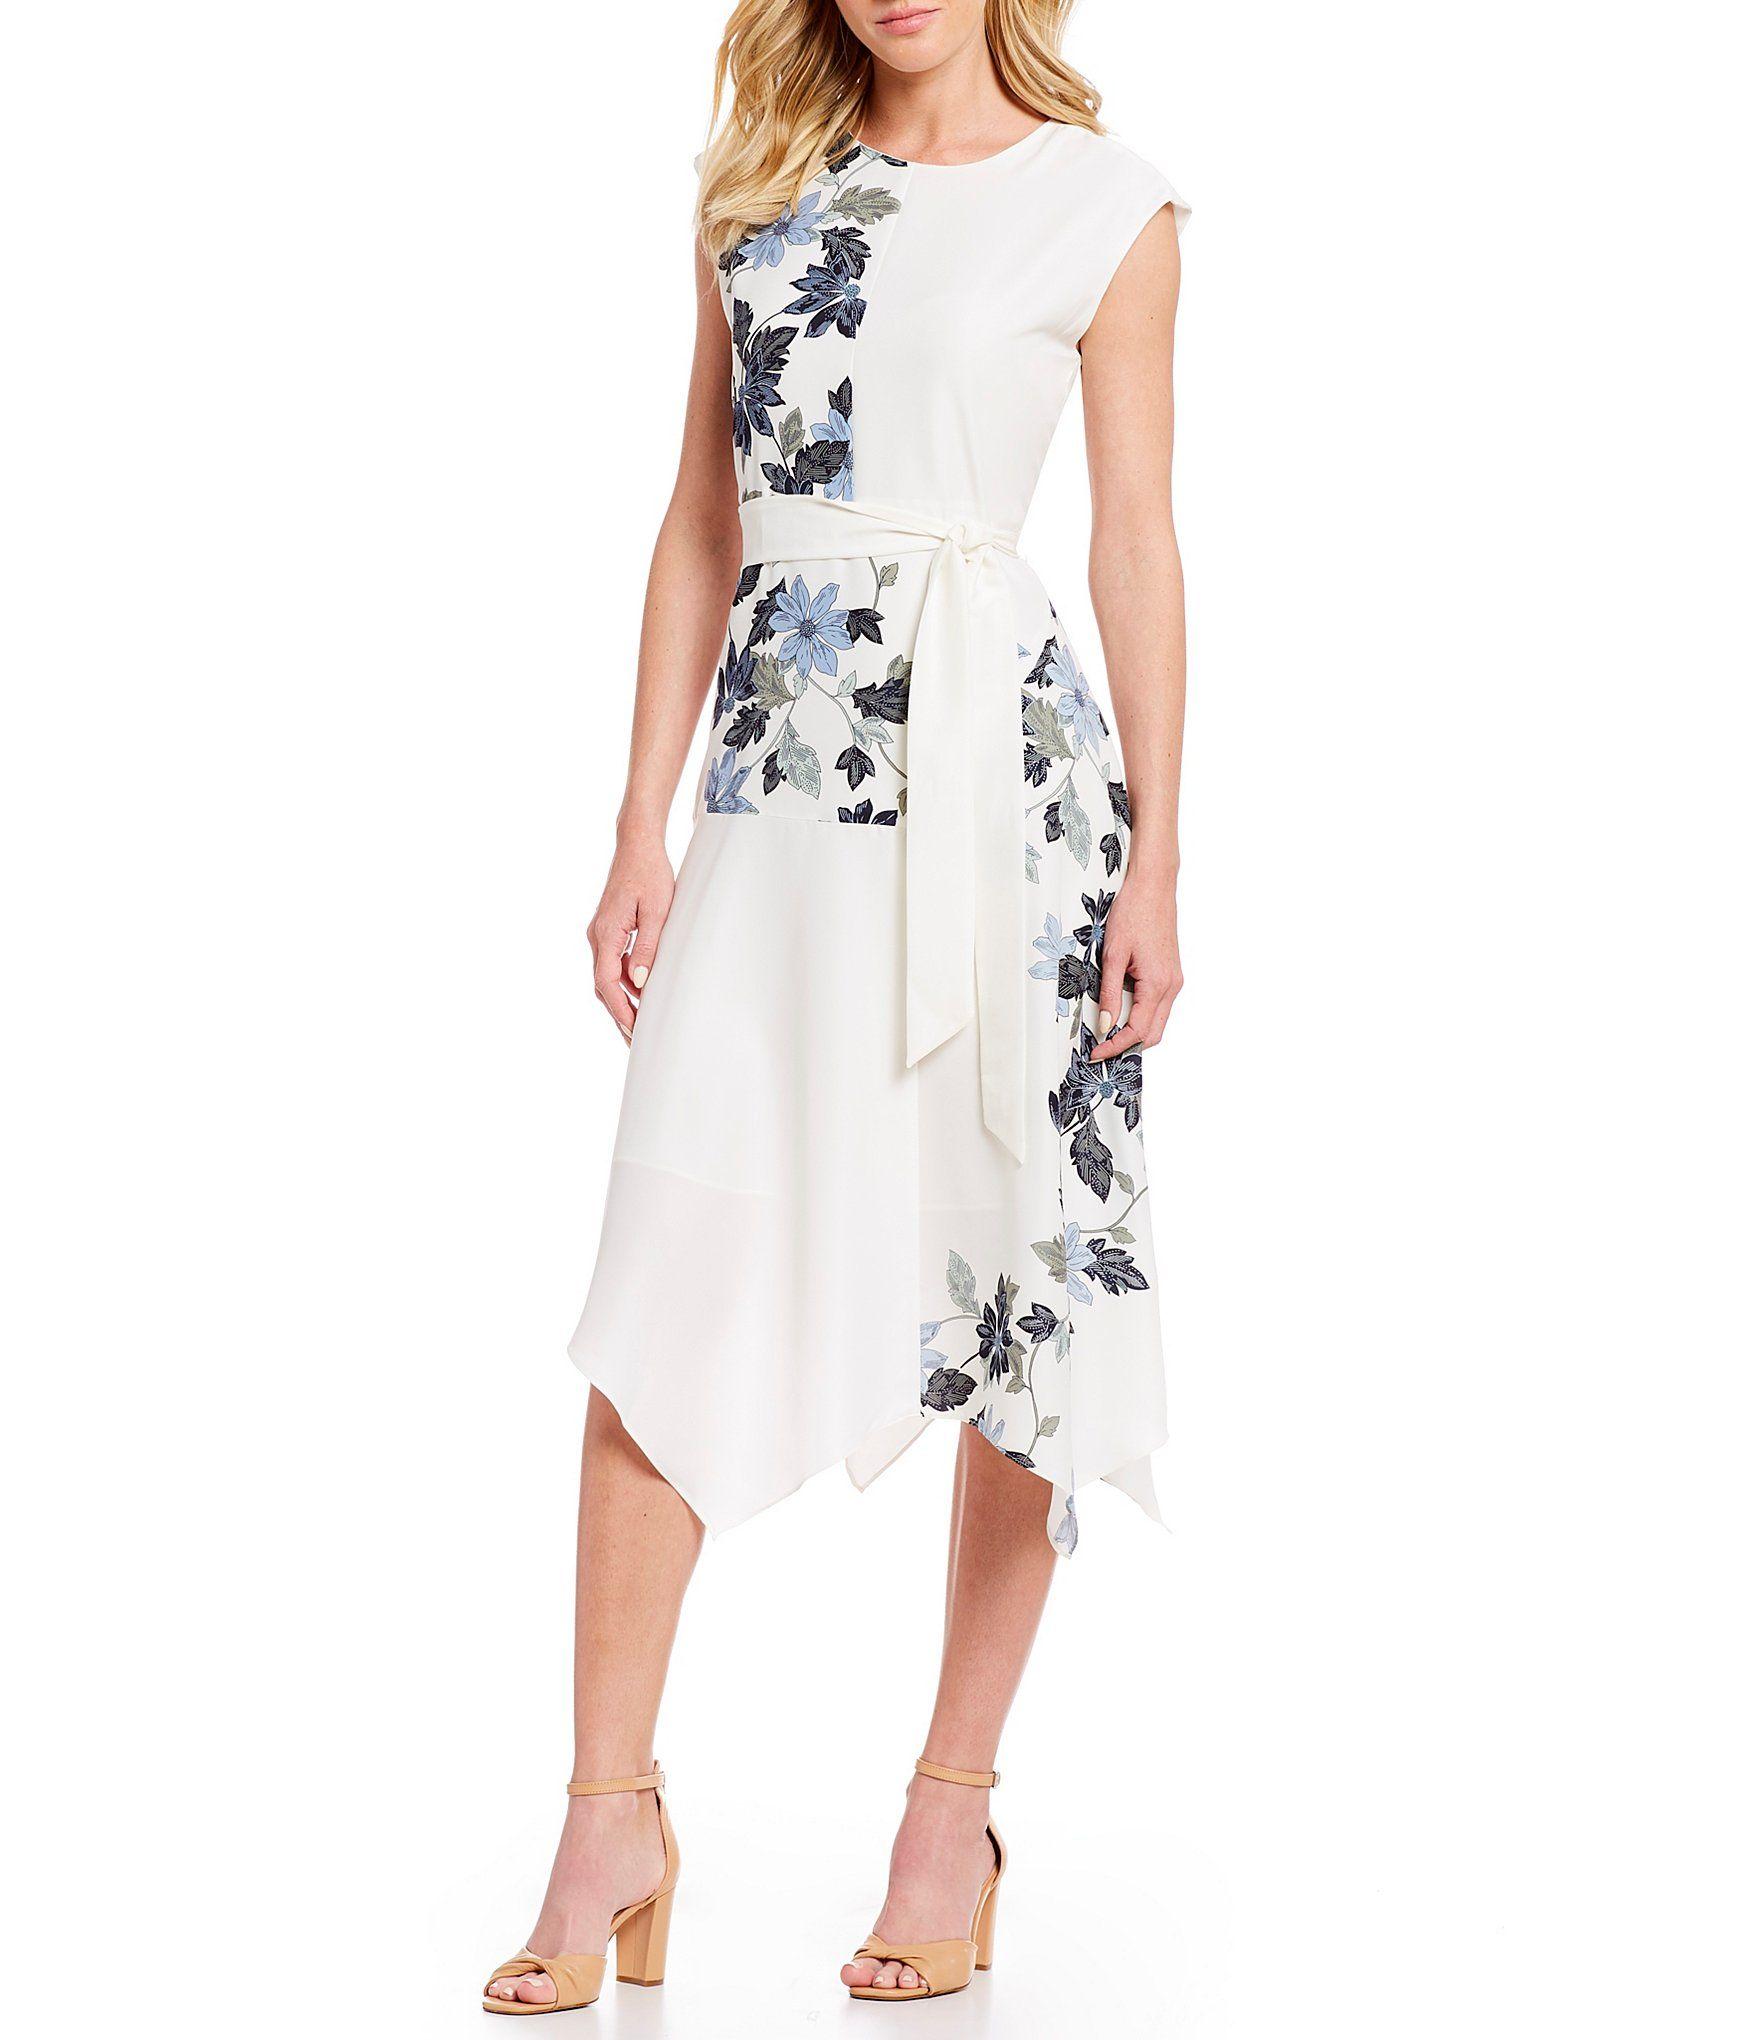 aee77d407af Vince Camuto Cap Sleeve Floral Print Asymmetrical Hem Belted Midi Dress   Dillards